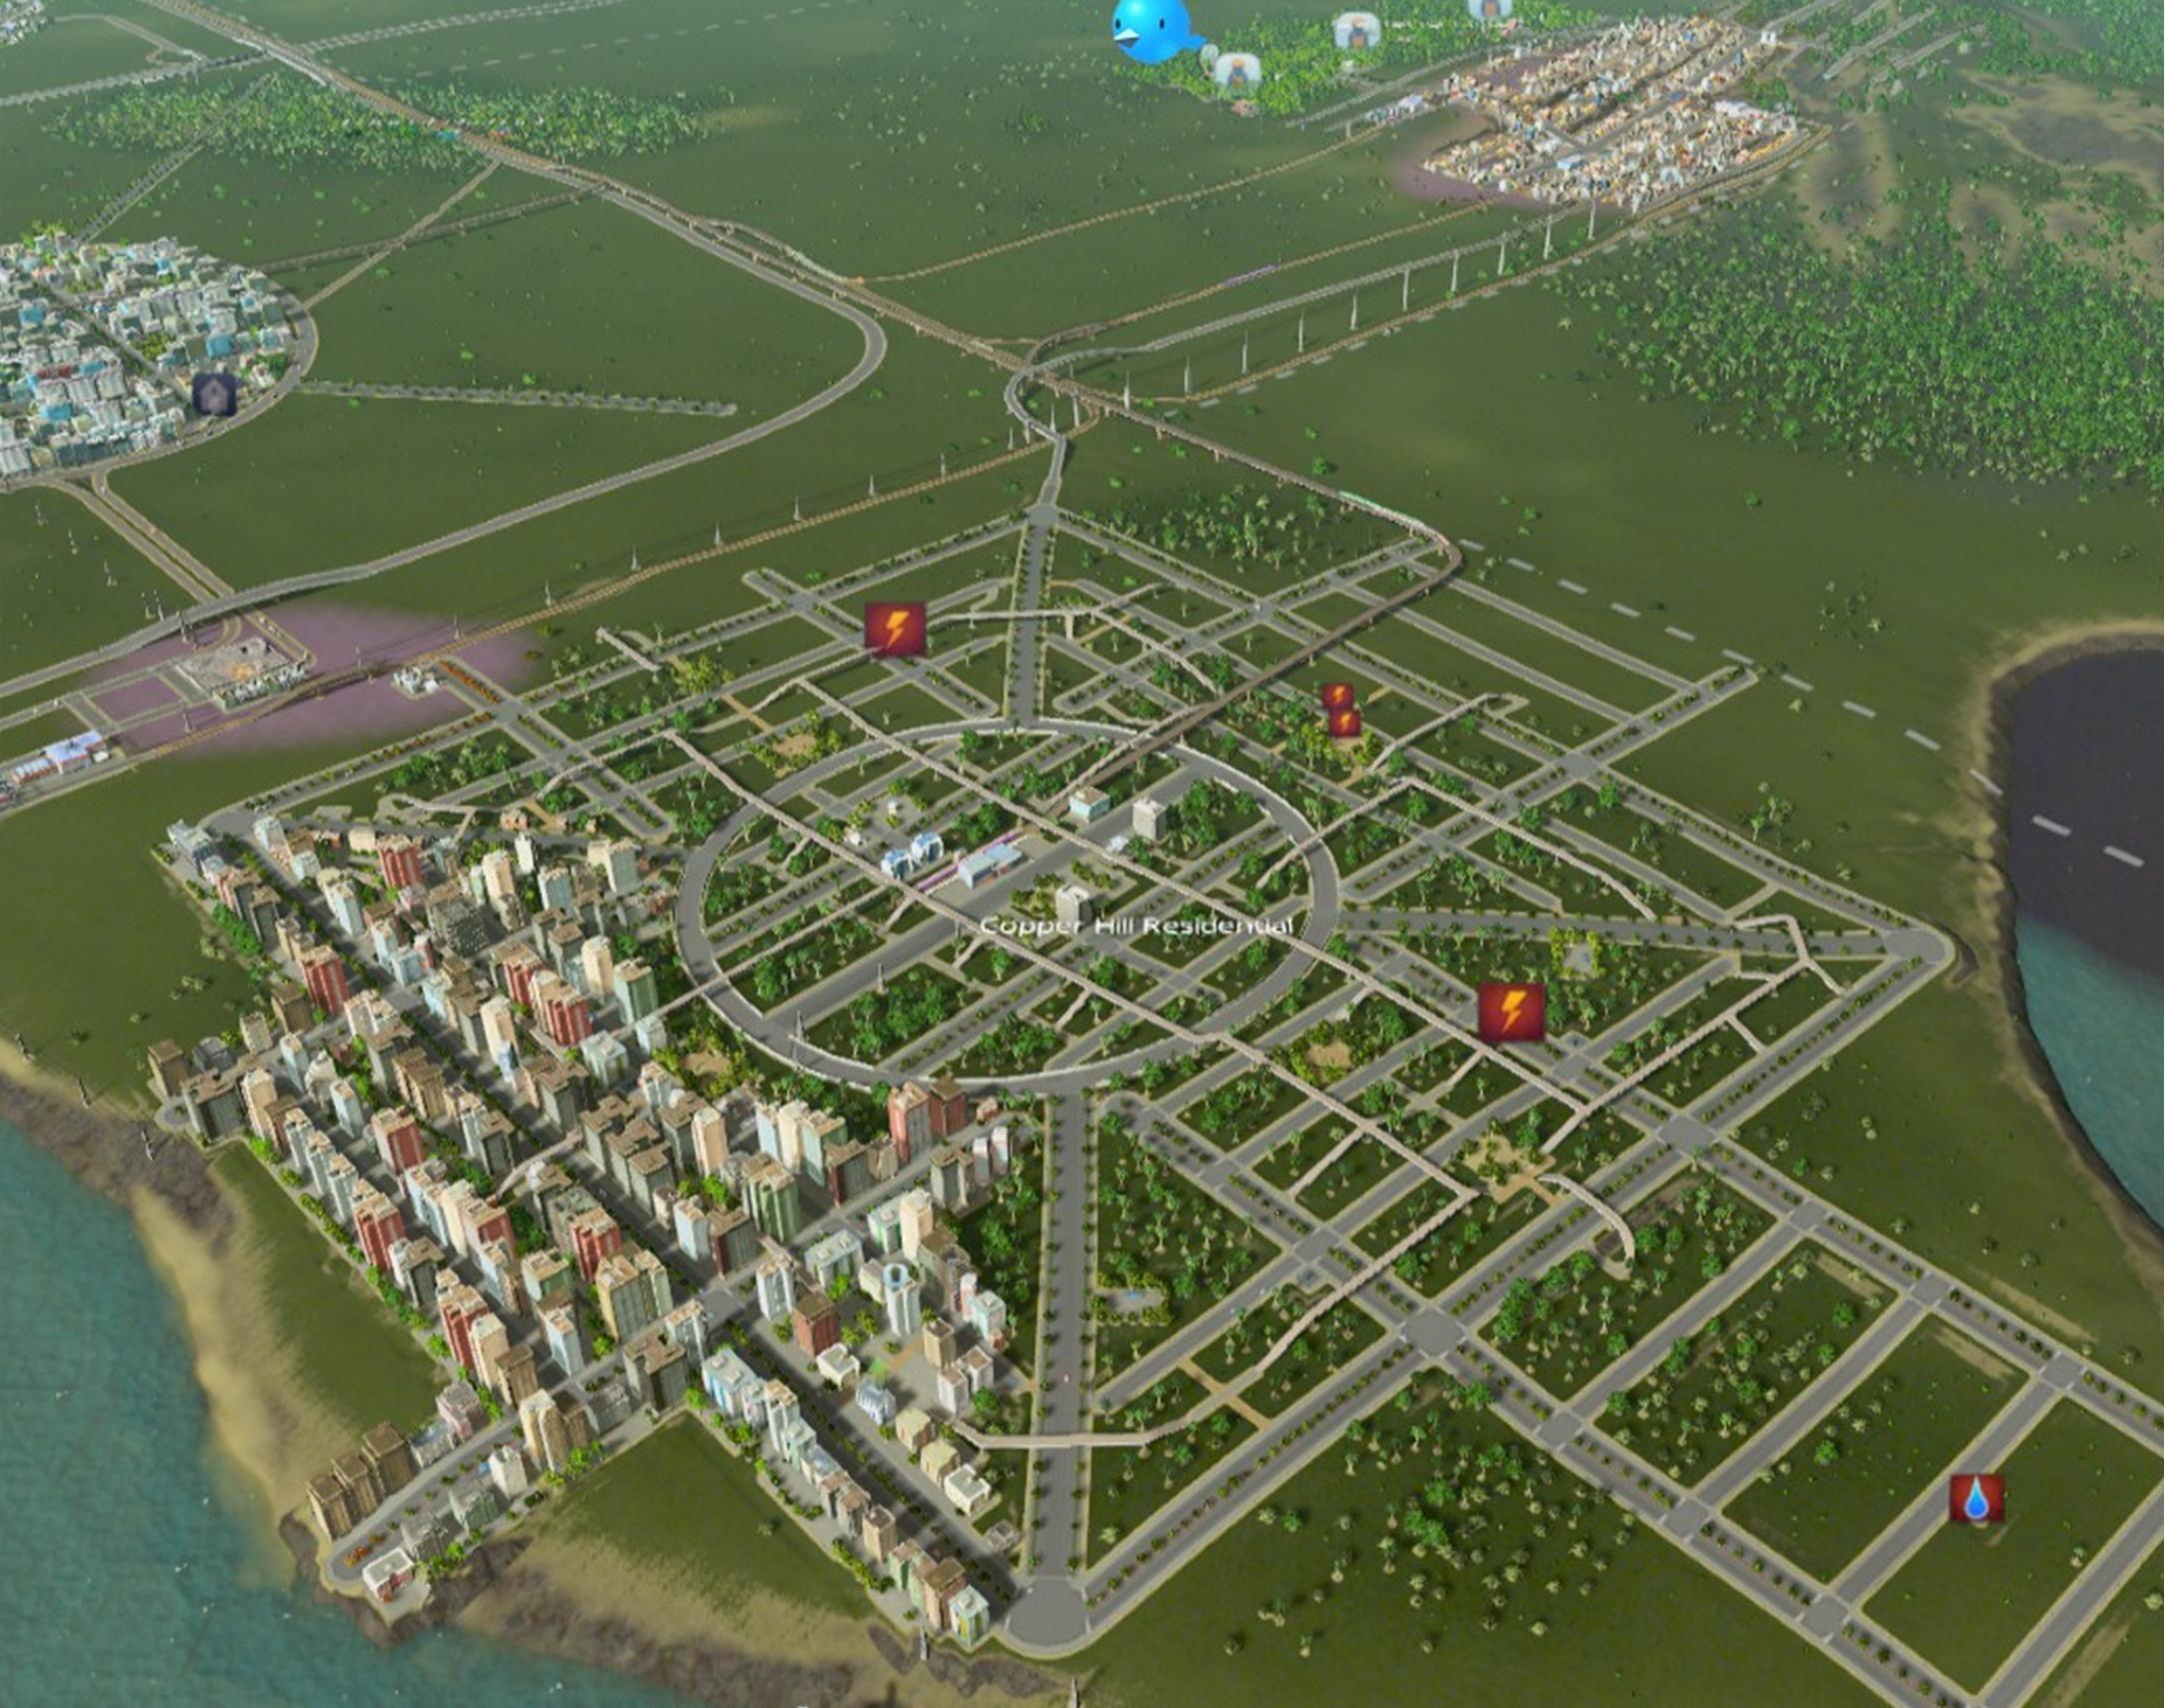 One Square Block Road Network City Layout City Design Landscape Architecture Design